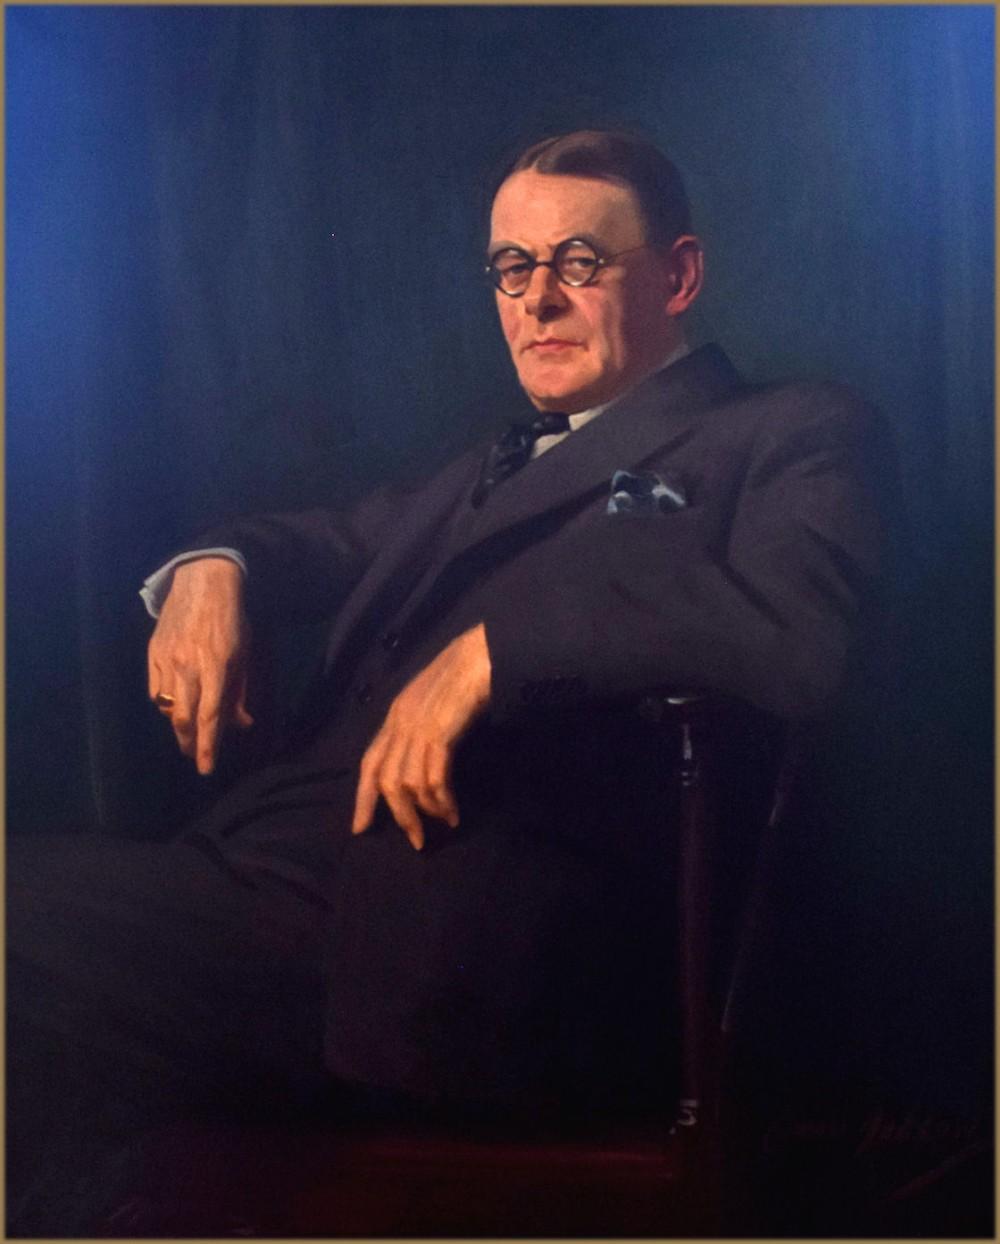 cowan dobson rba rp 1893 1980portrait of sir john alexander hammerton 18711949 writer and editor